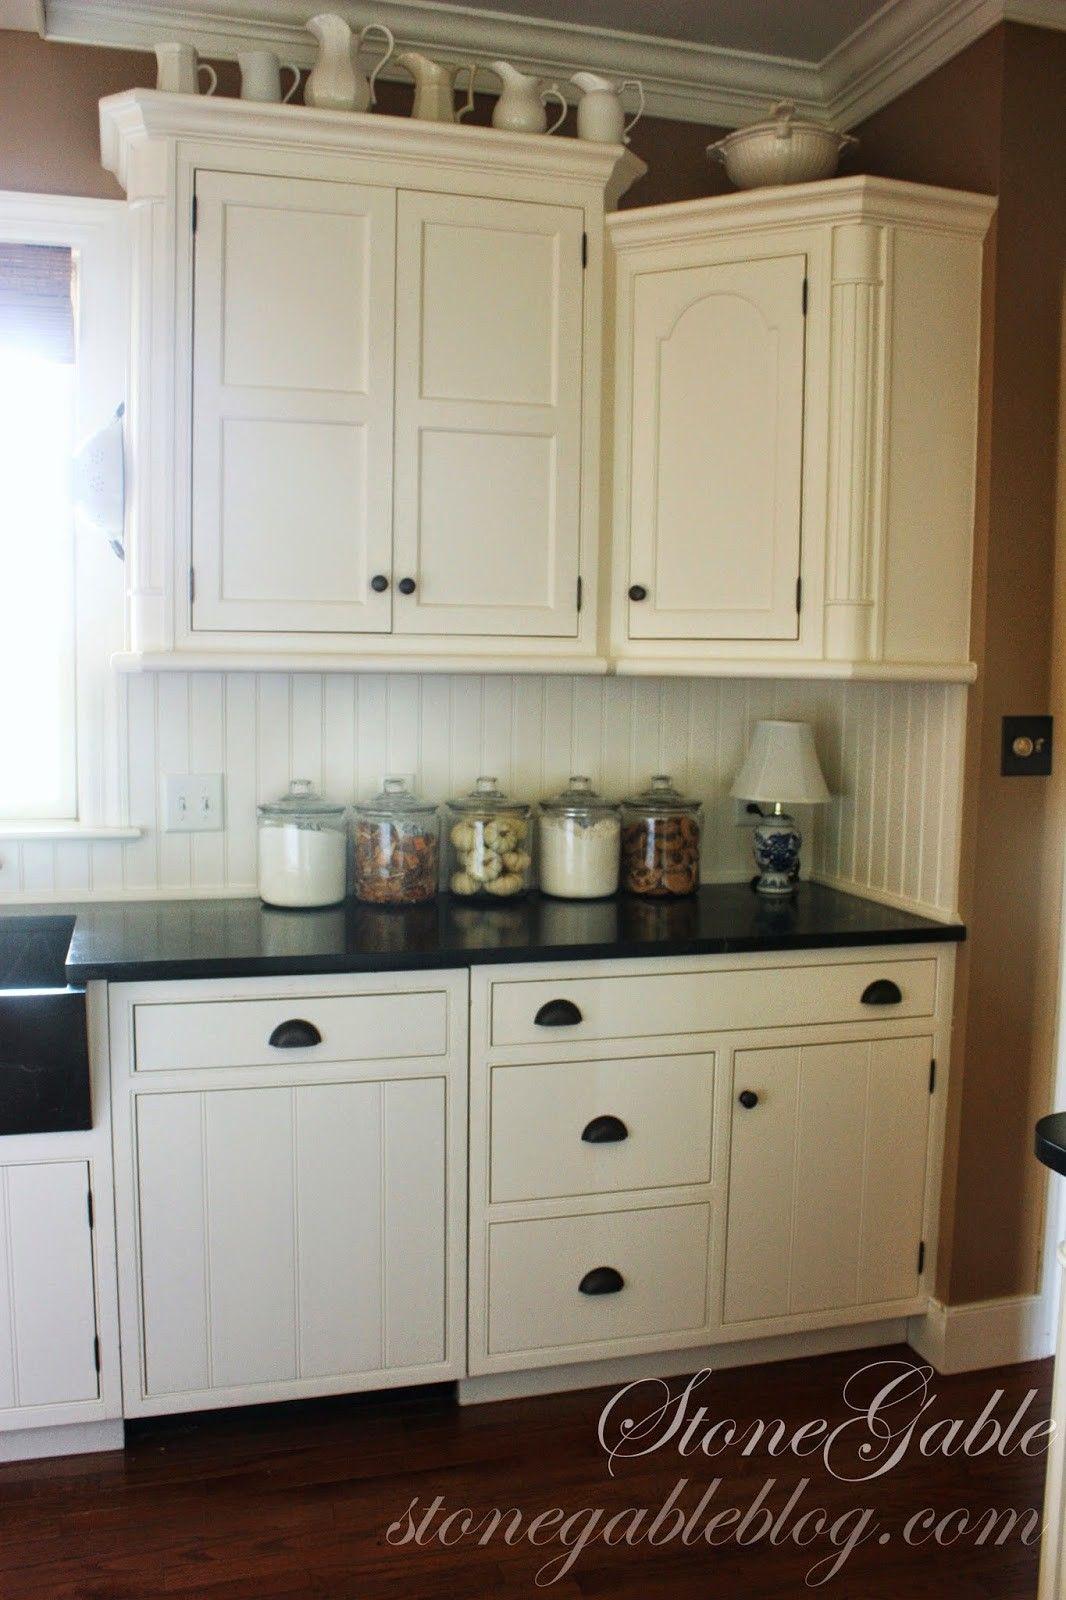 Inspirational Farmhouse Kitchen Cupboard Doors The Incredible And Lovely Farmhouse Kitchen Cupboard Do Tuscan Kitchen Farmhouse Style Kitchen Kitchen Remodel